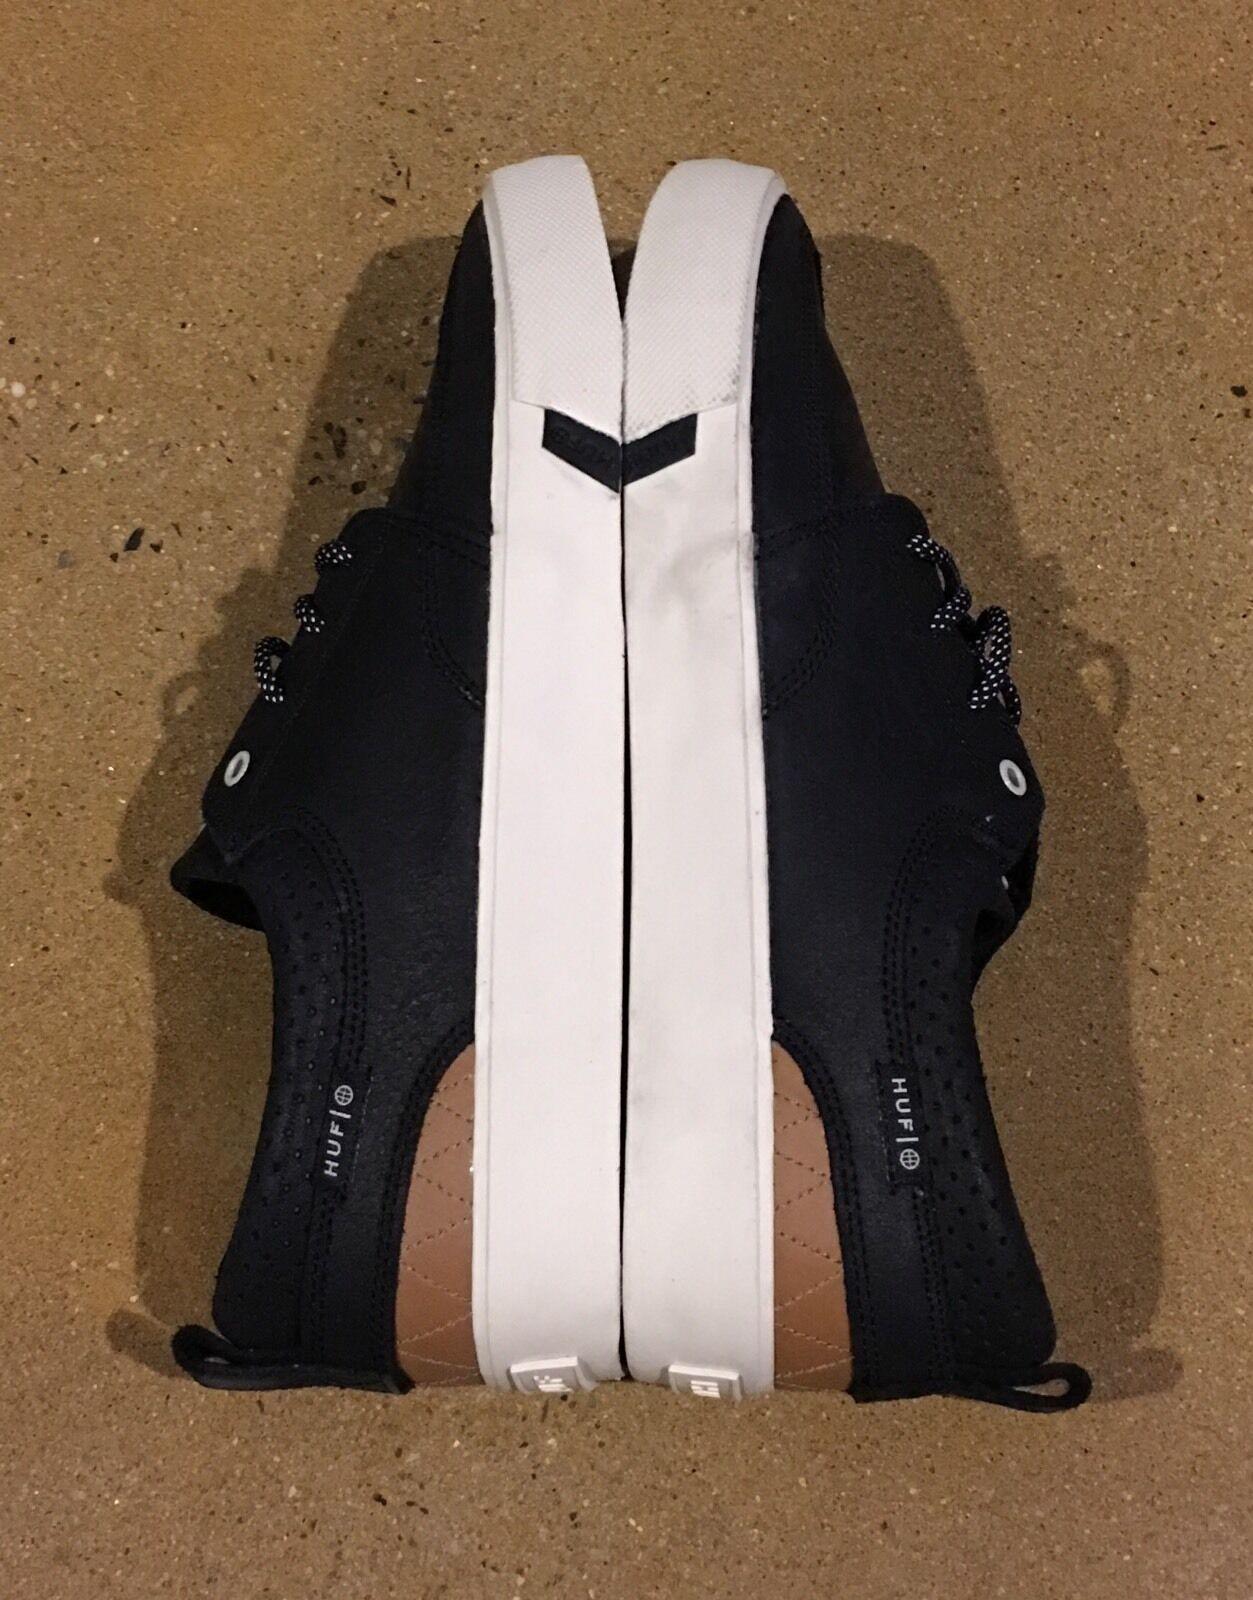 Huf Ramondetta Size 11 US Black Hide Peter Ramondetta Skate Shoes Sneakers